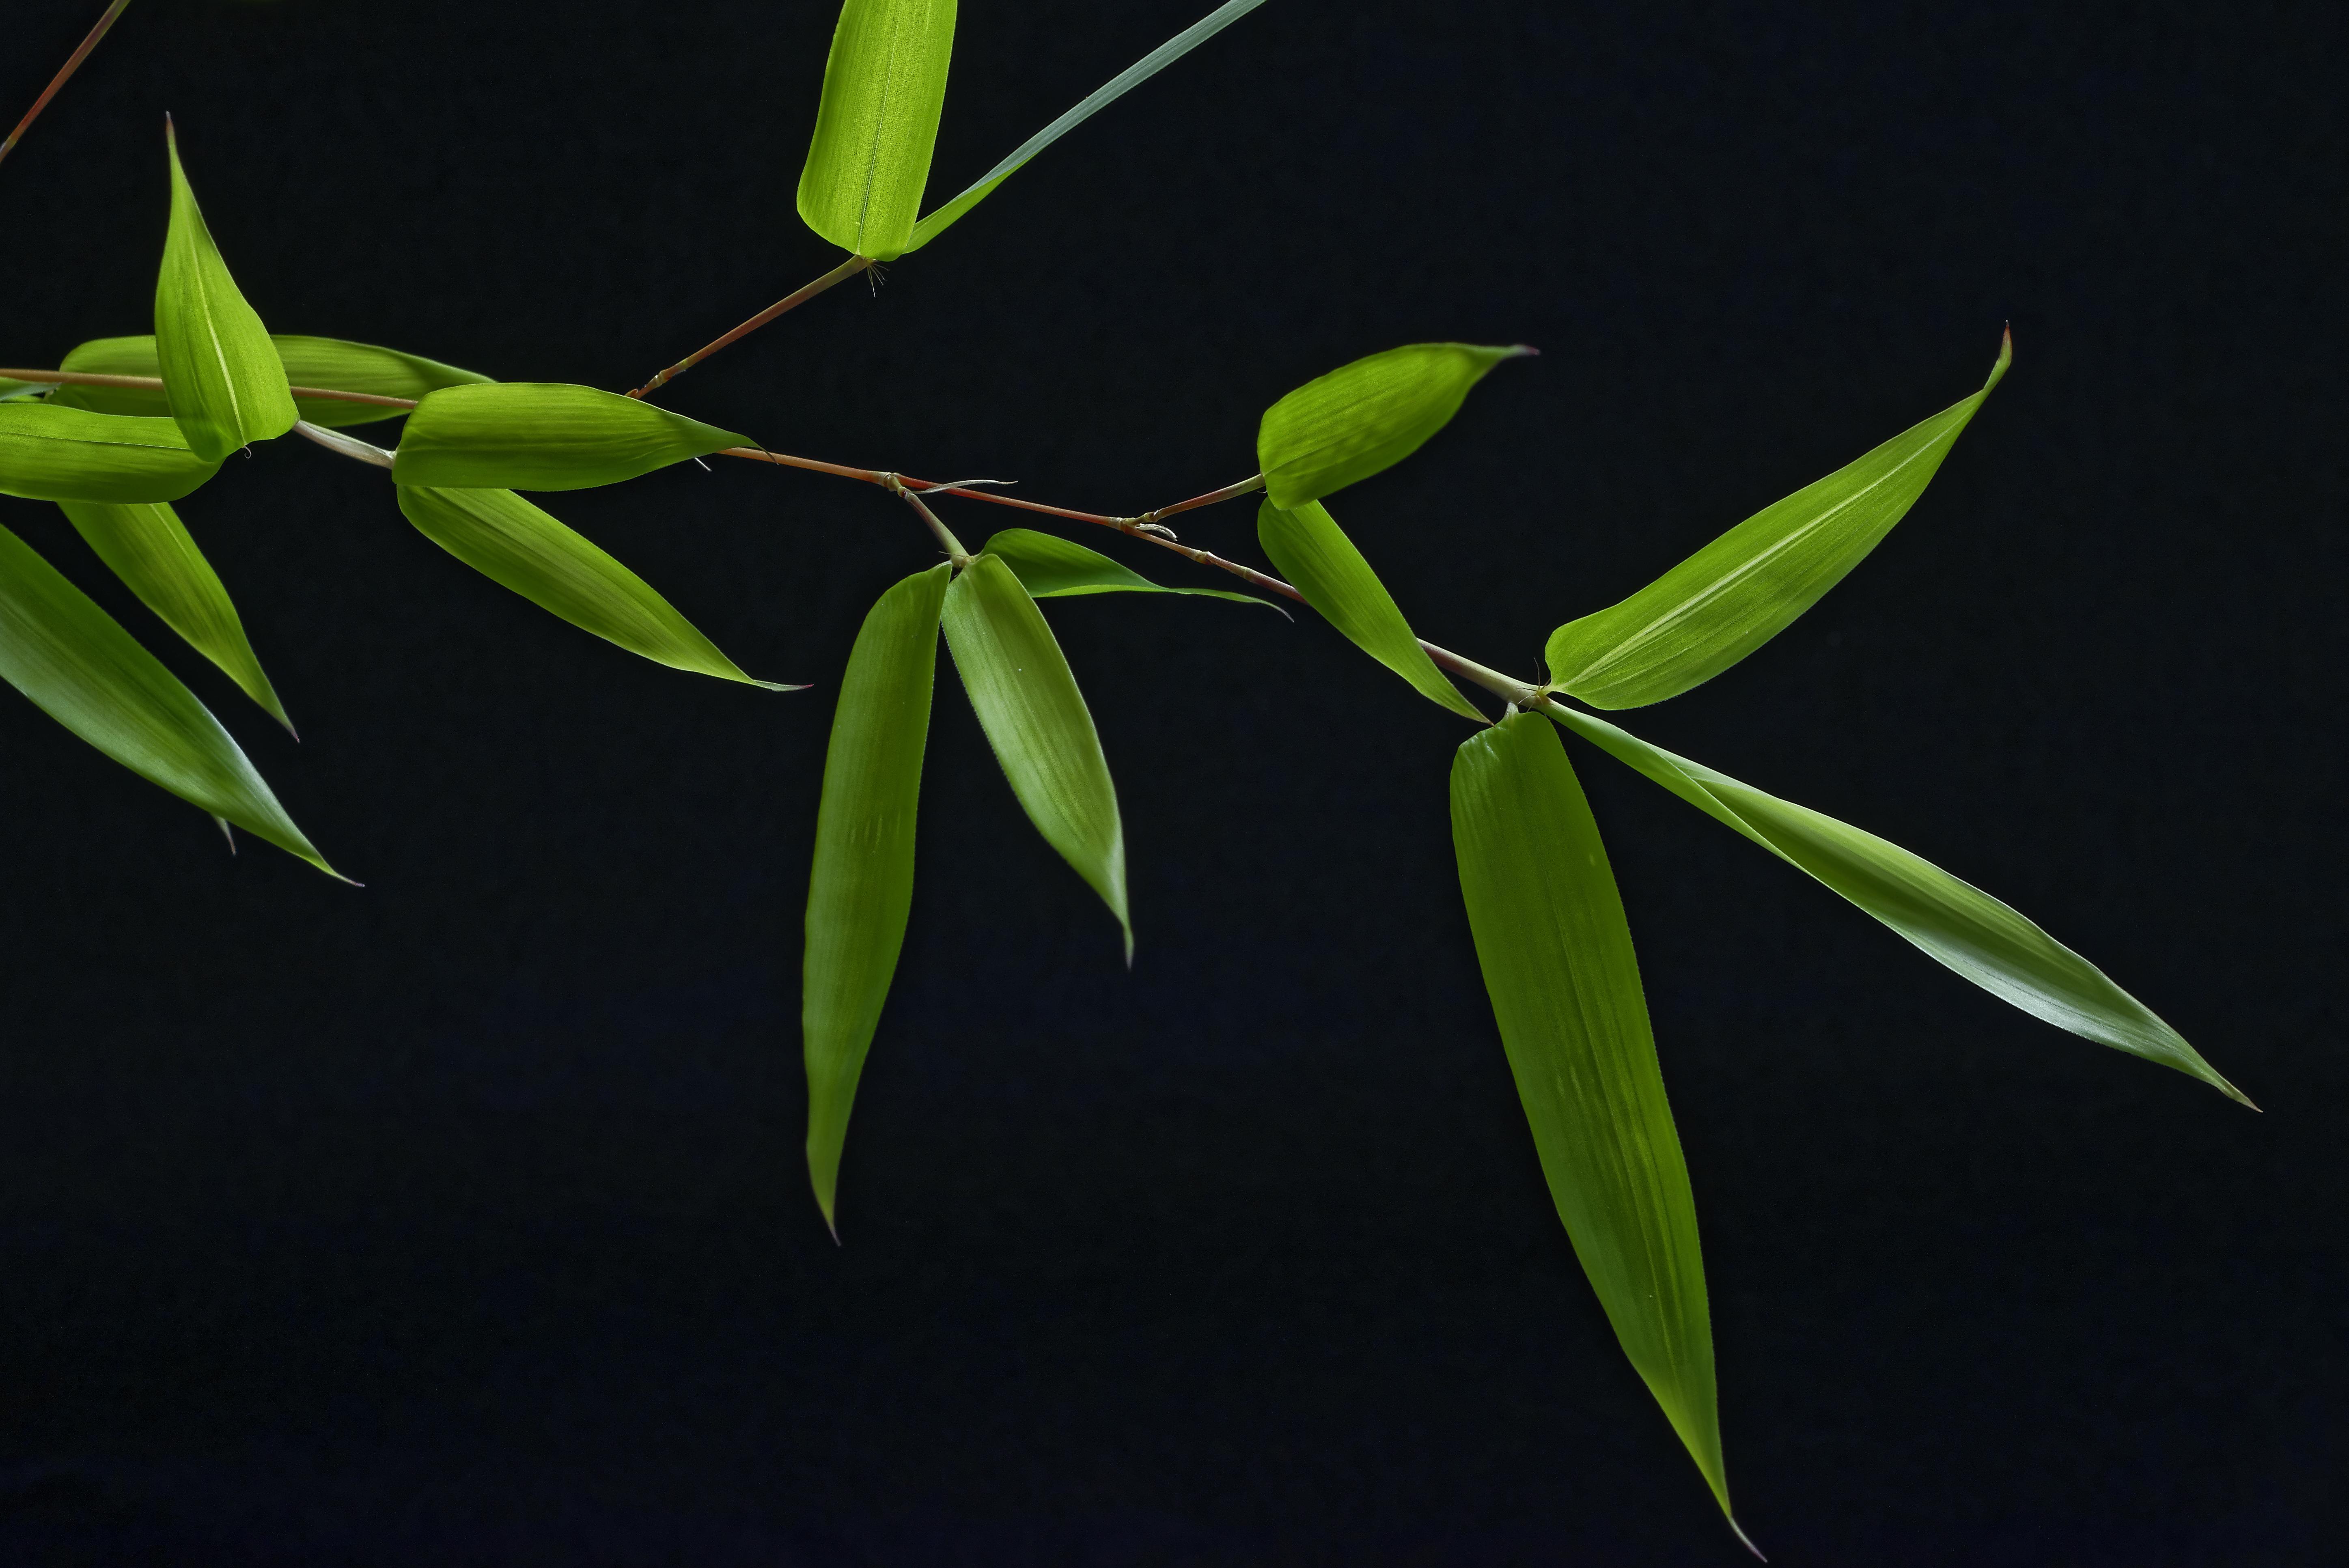 Обои Bamboo, ветка, бамбук, чёрный фон